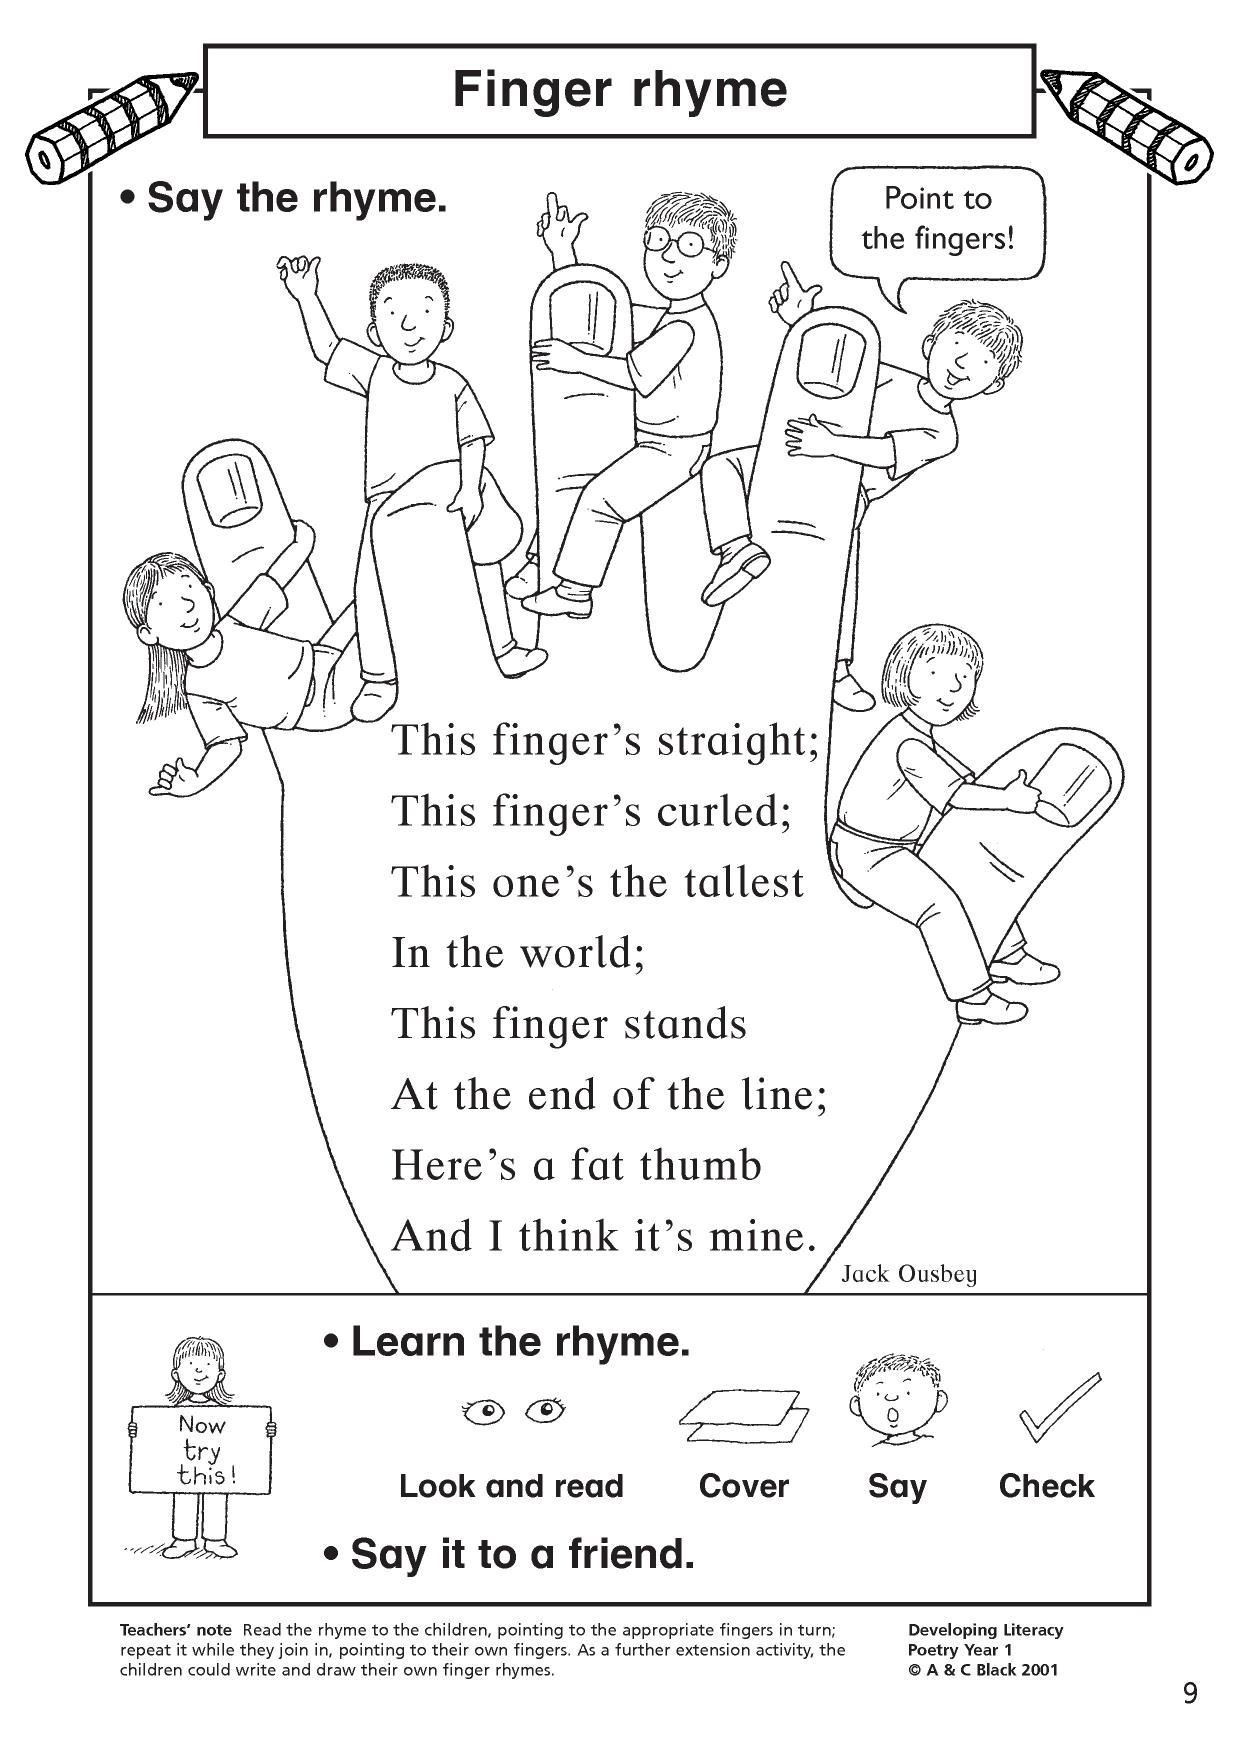 EYFS KS1 KS2 Poetry exploring rhythm and rhyming